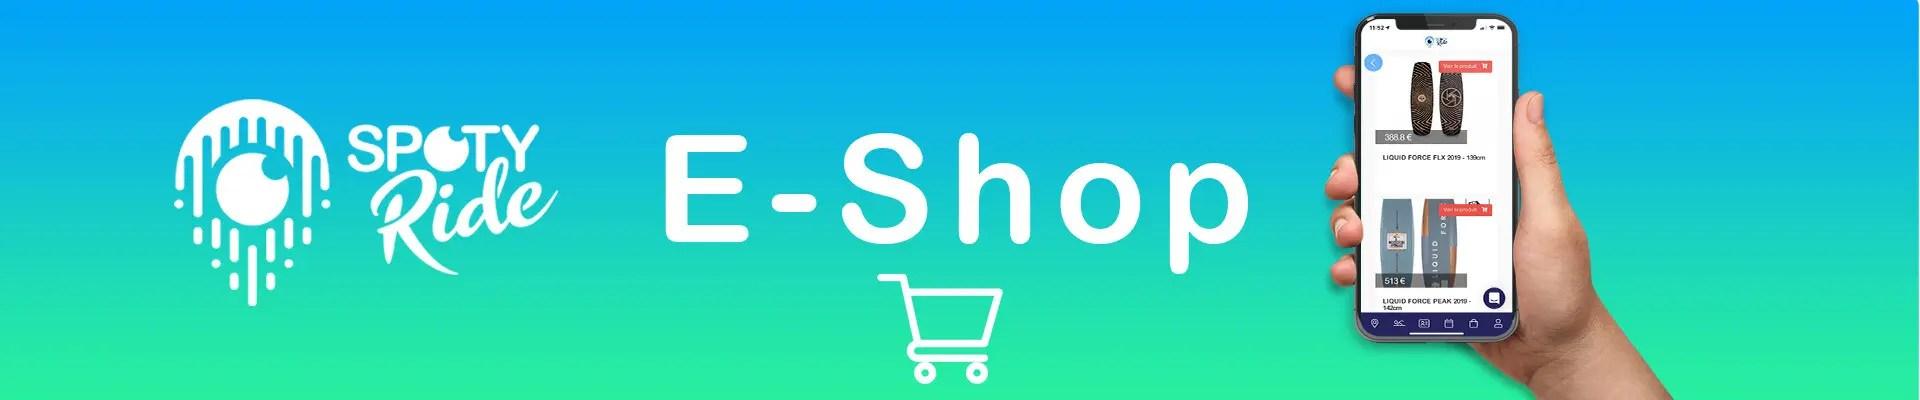 Aheader-E-Shop-spotyride-1 Unleashed France